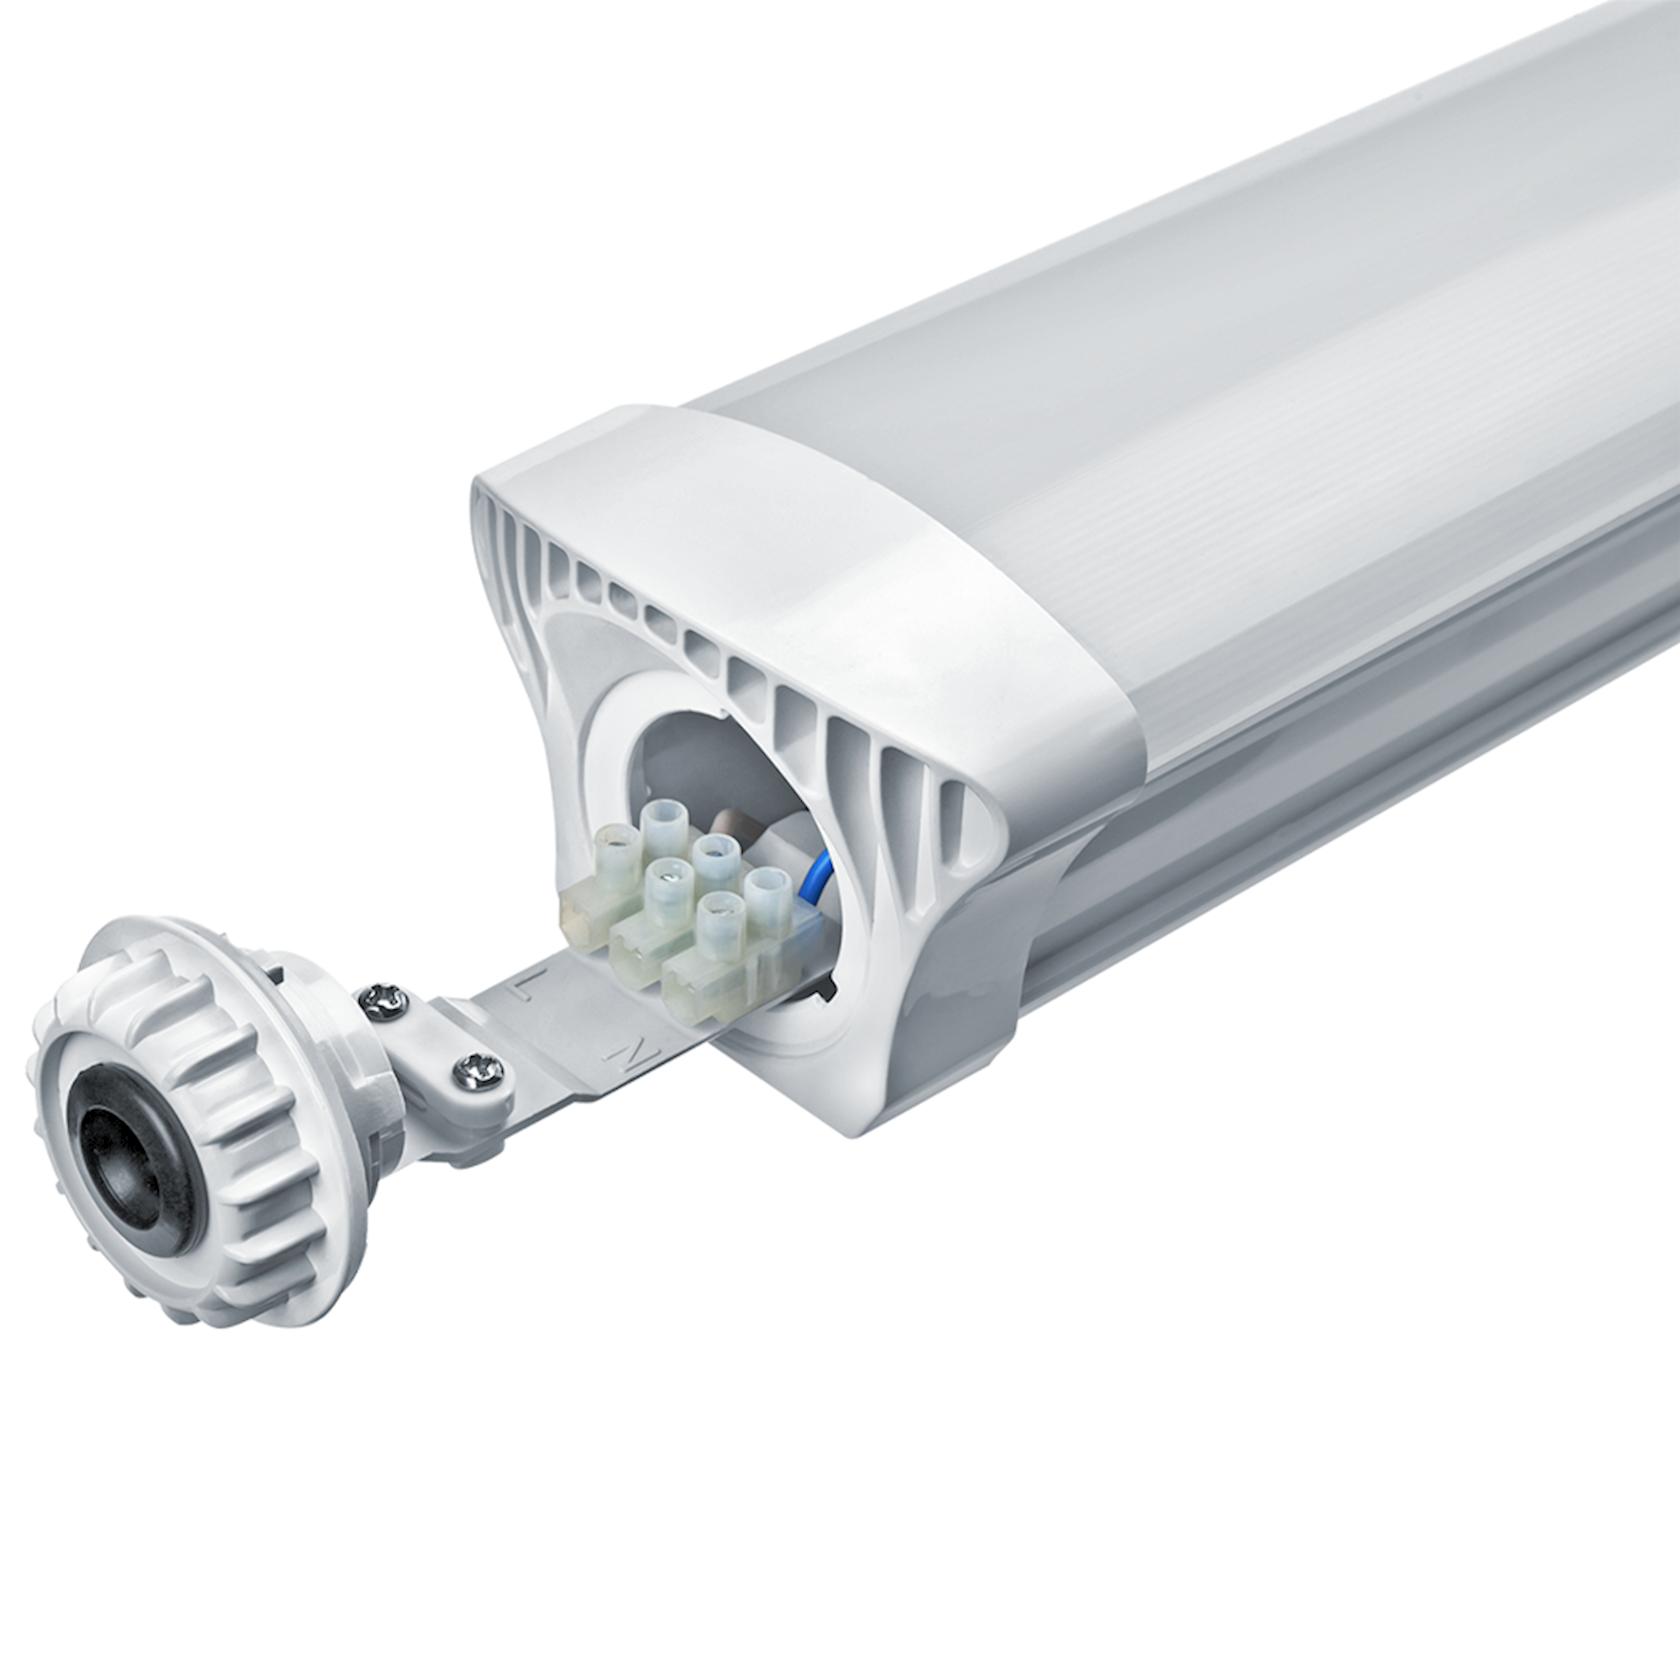 LED çıraq Navigator DSP-CC-18-6.5K-IP65-LED-R, 18Vt, ağ rəng, ölçü 600x80x64mm